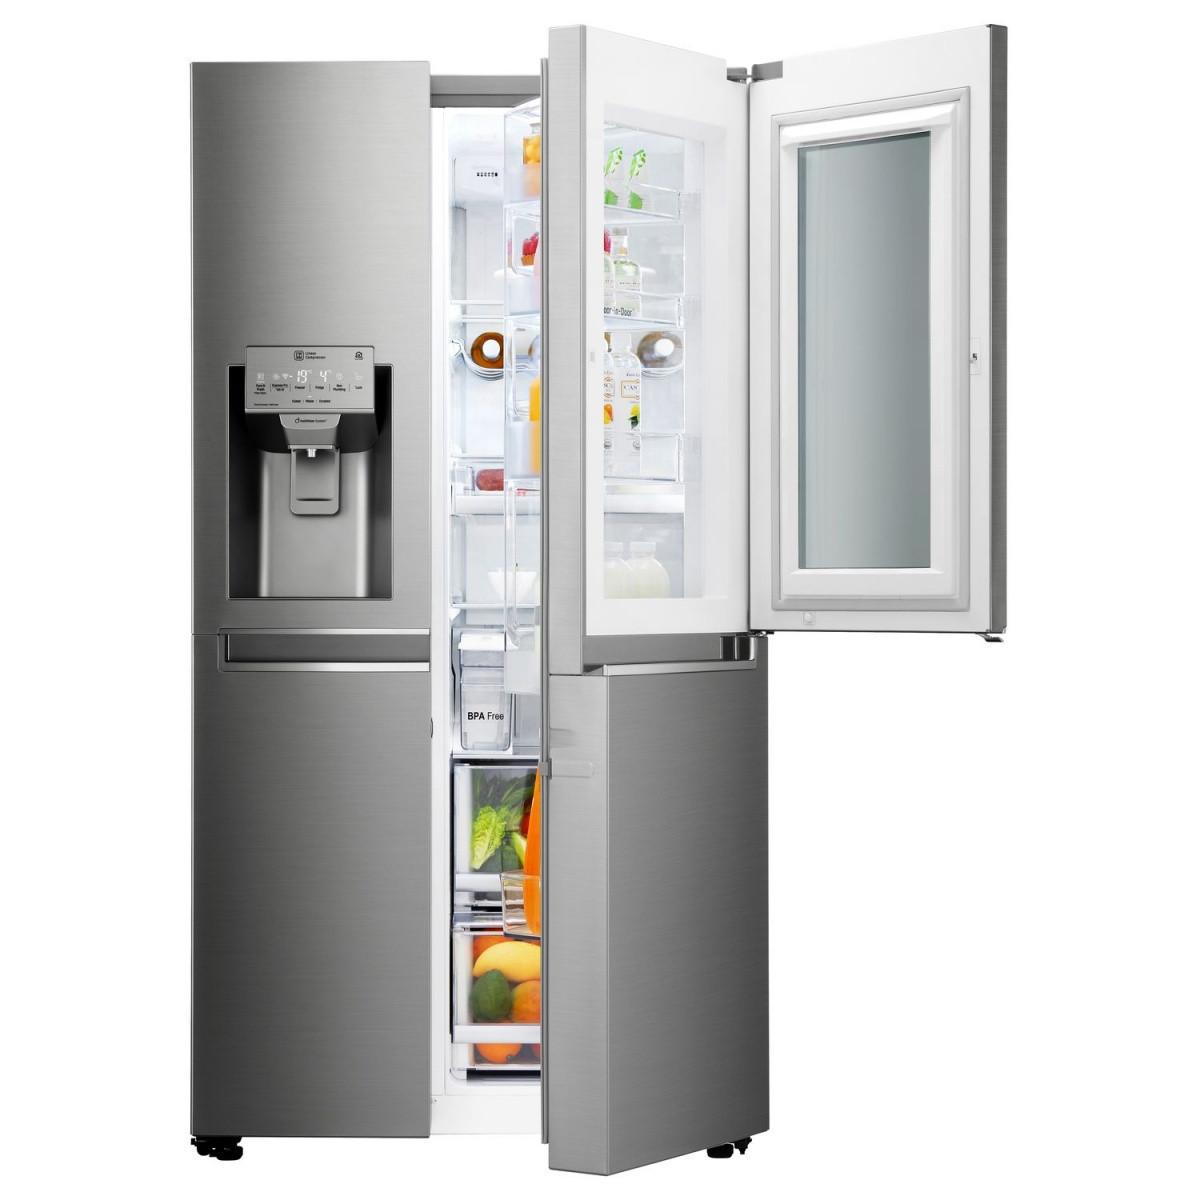 Lg Fridge Lg Gbb530nscfe Fridge Freezer Review 100 Lg 30